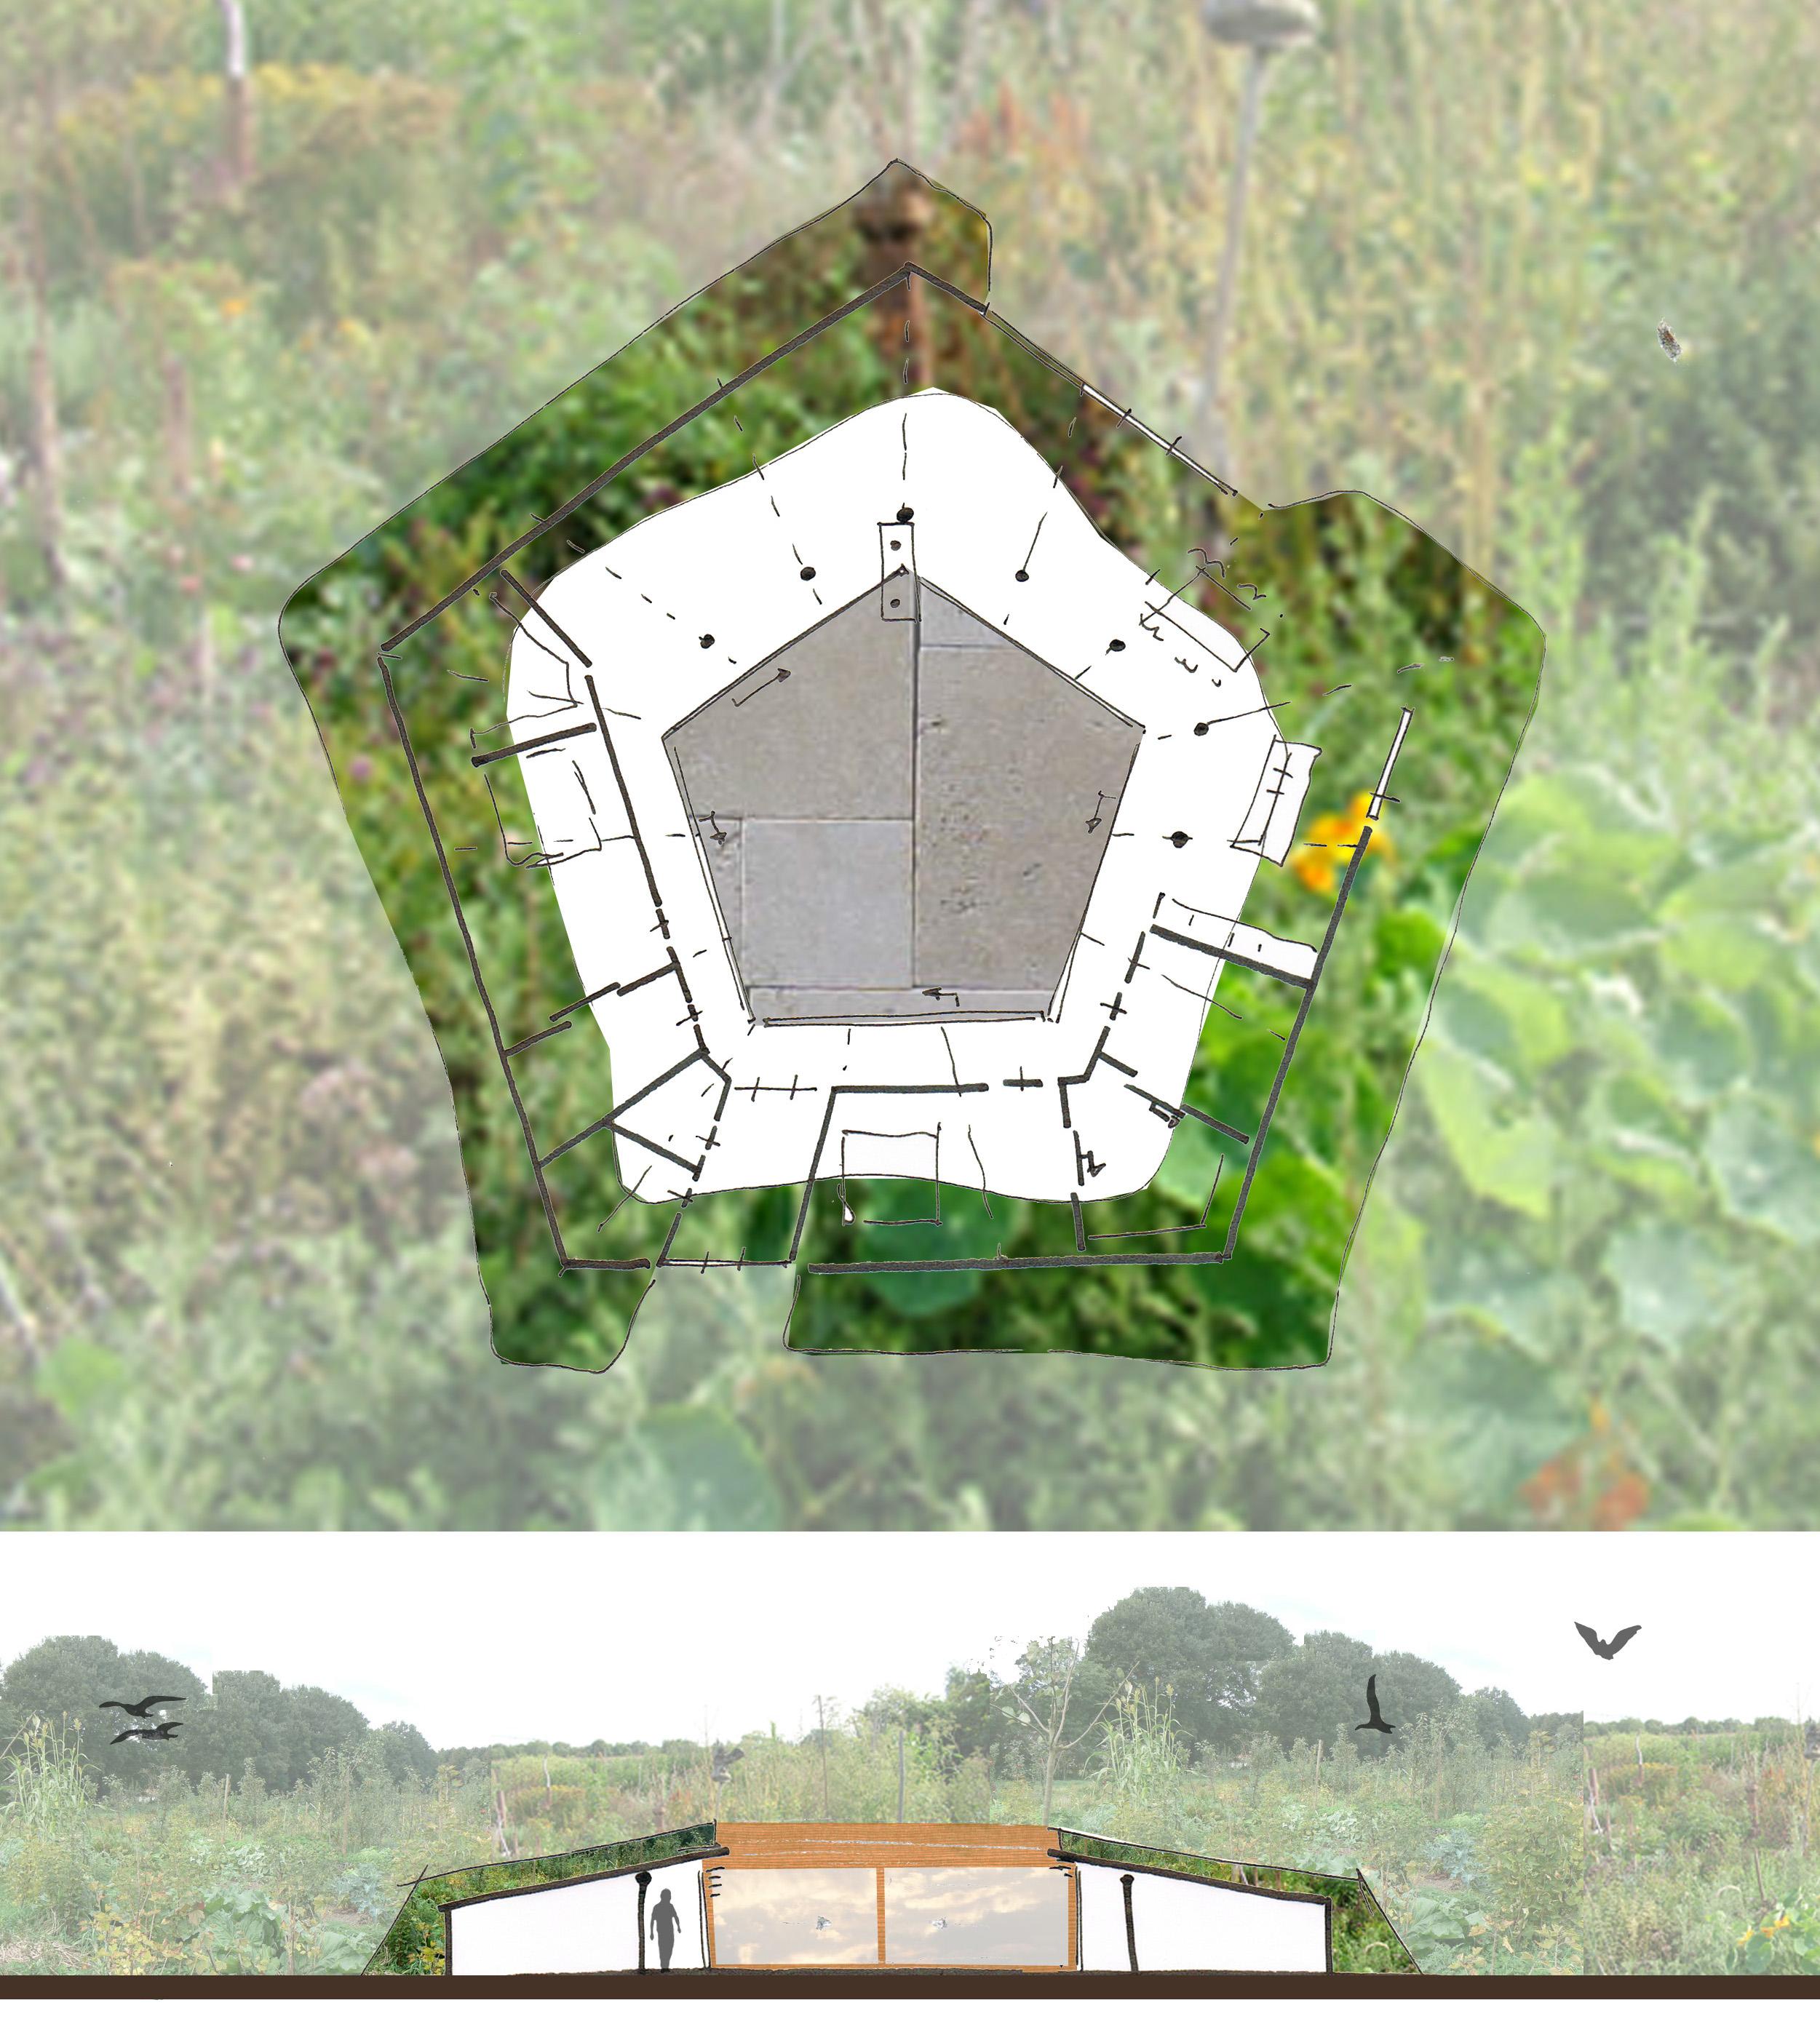 studio_stoel_architect_kampen_aardehuis (2a)